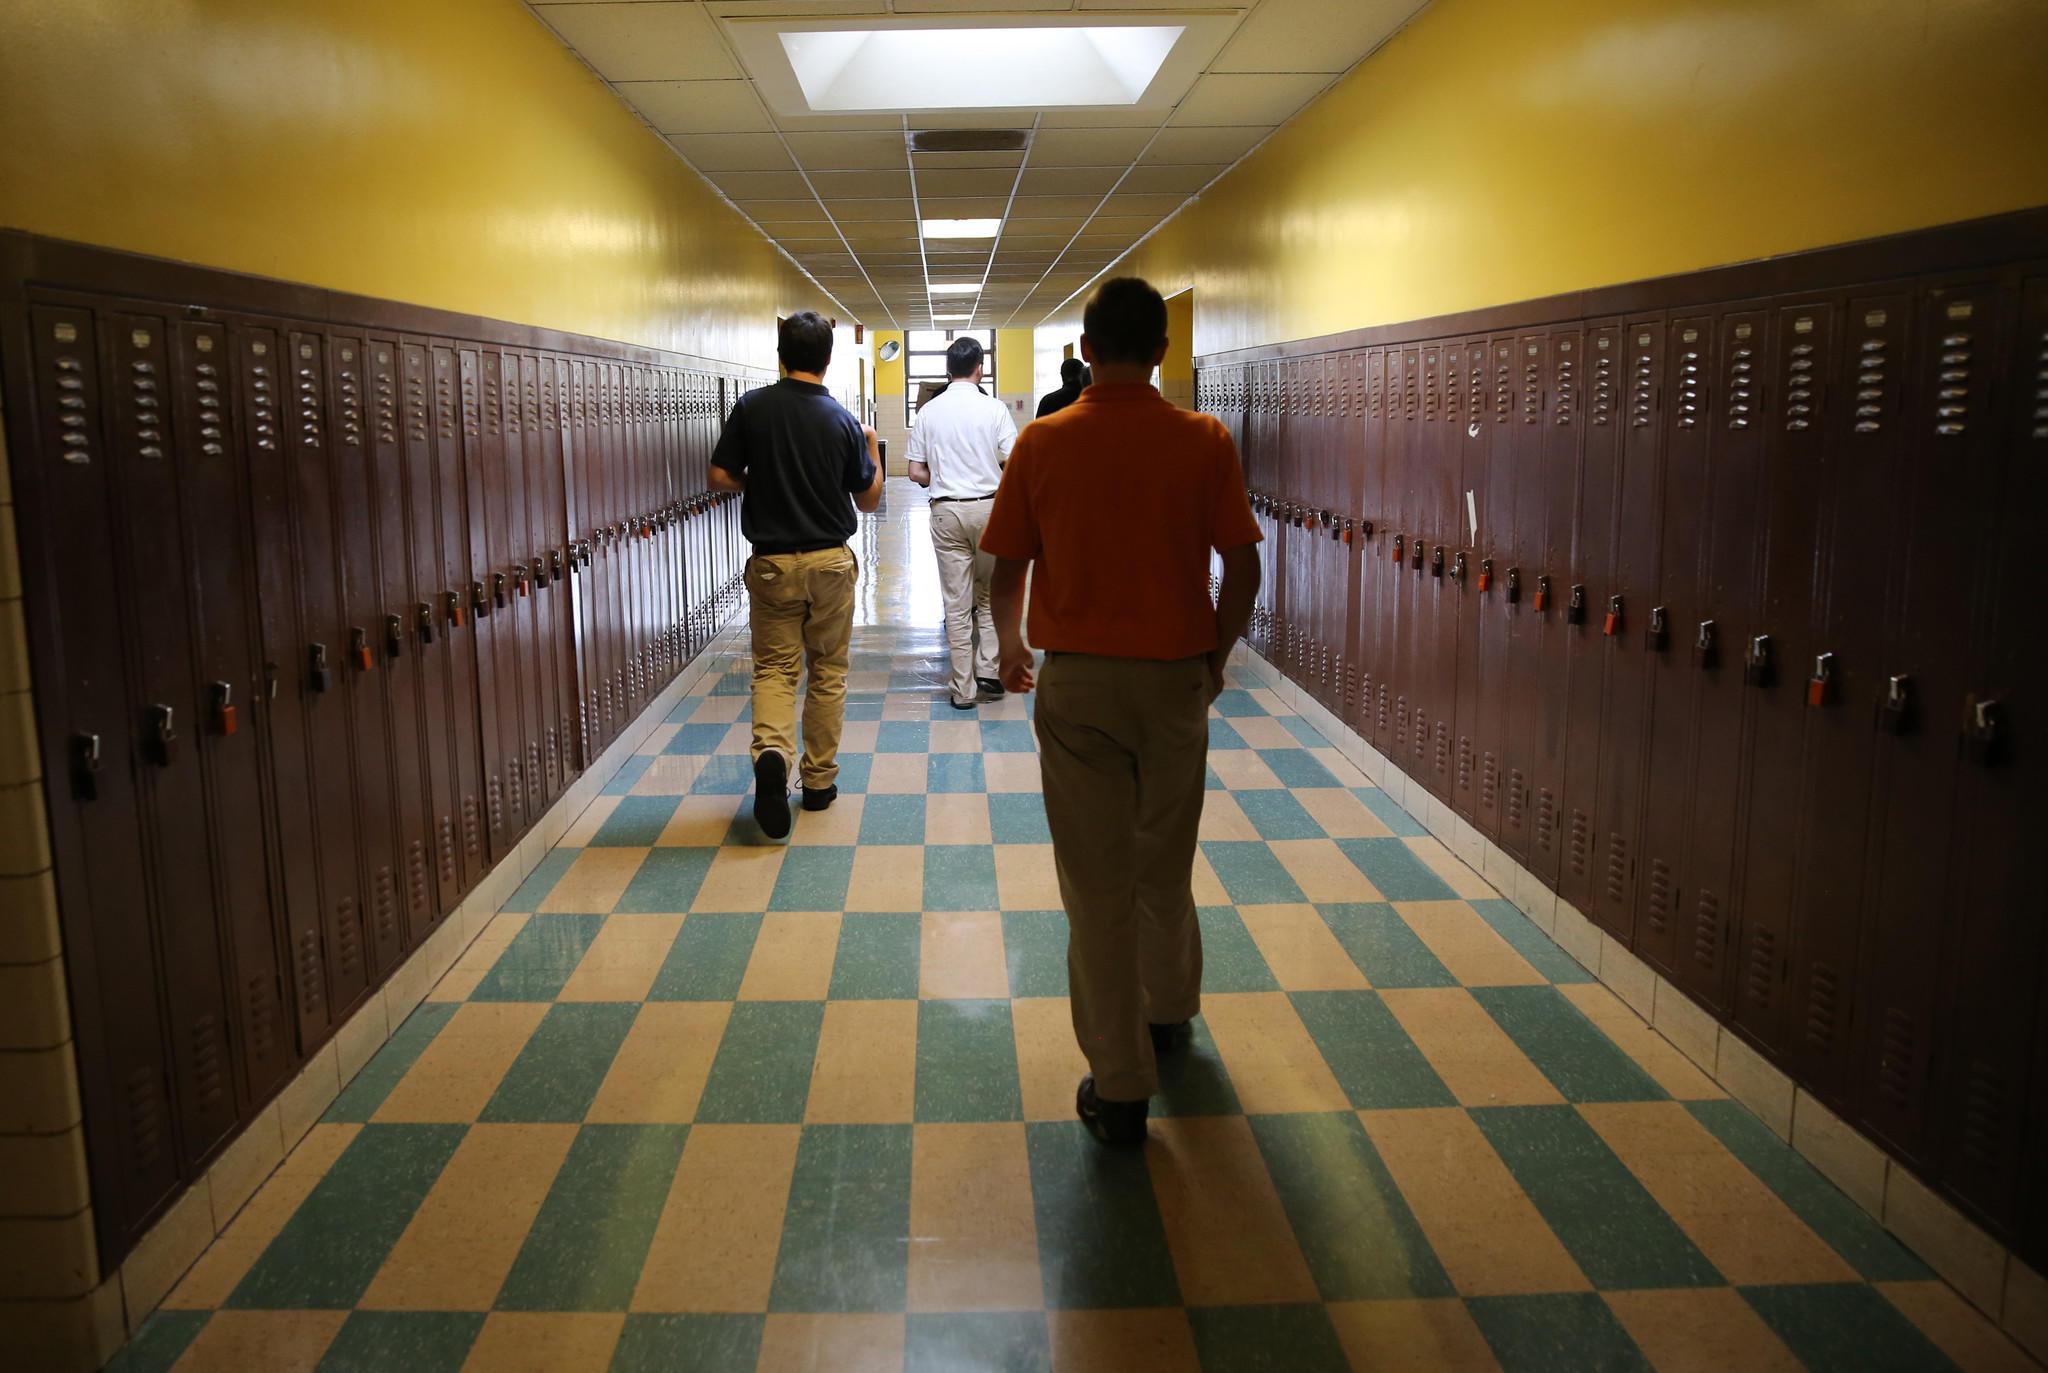 Gordon Tech students walk back toward their classroom after taking their standardized testing exams at Gordon Tech High School.